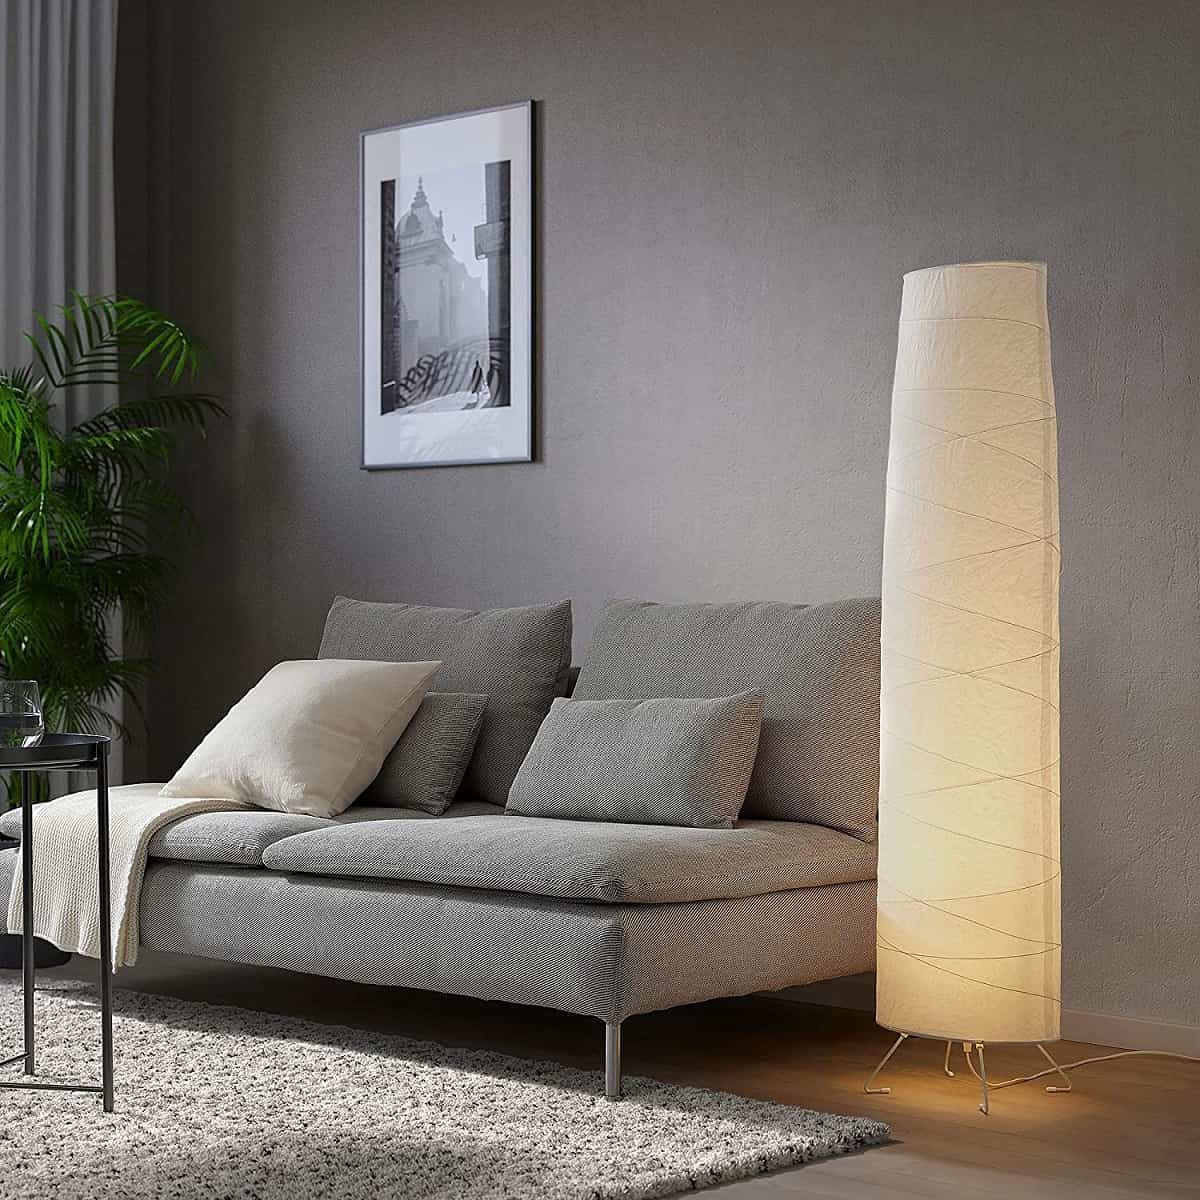 10 lamparas de pie de ikea para decorar tu hogar 2